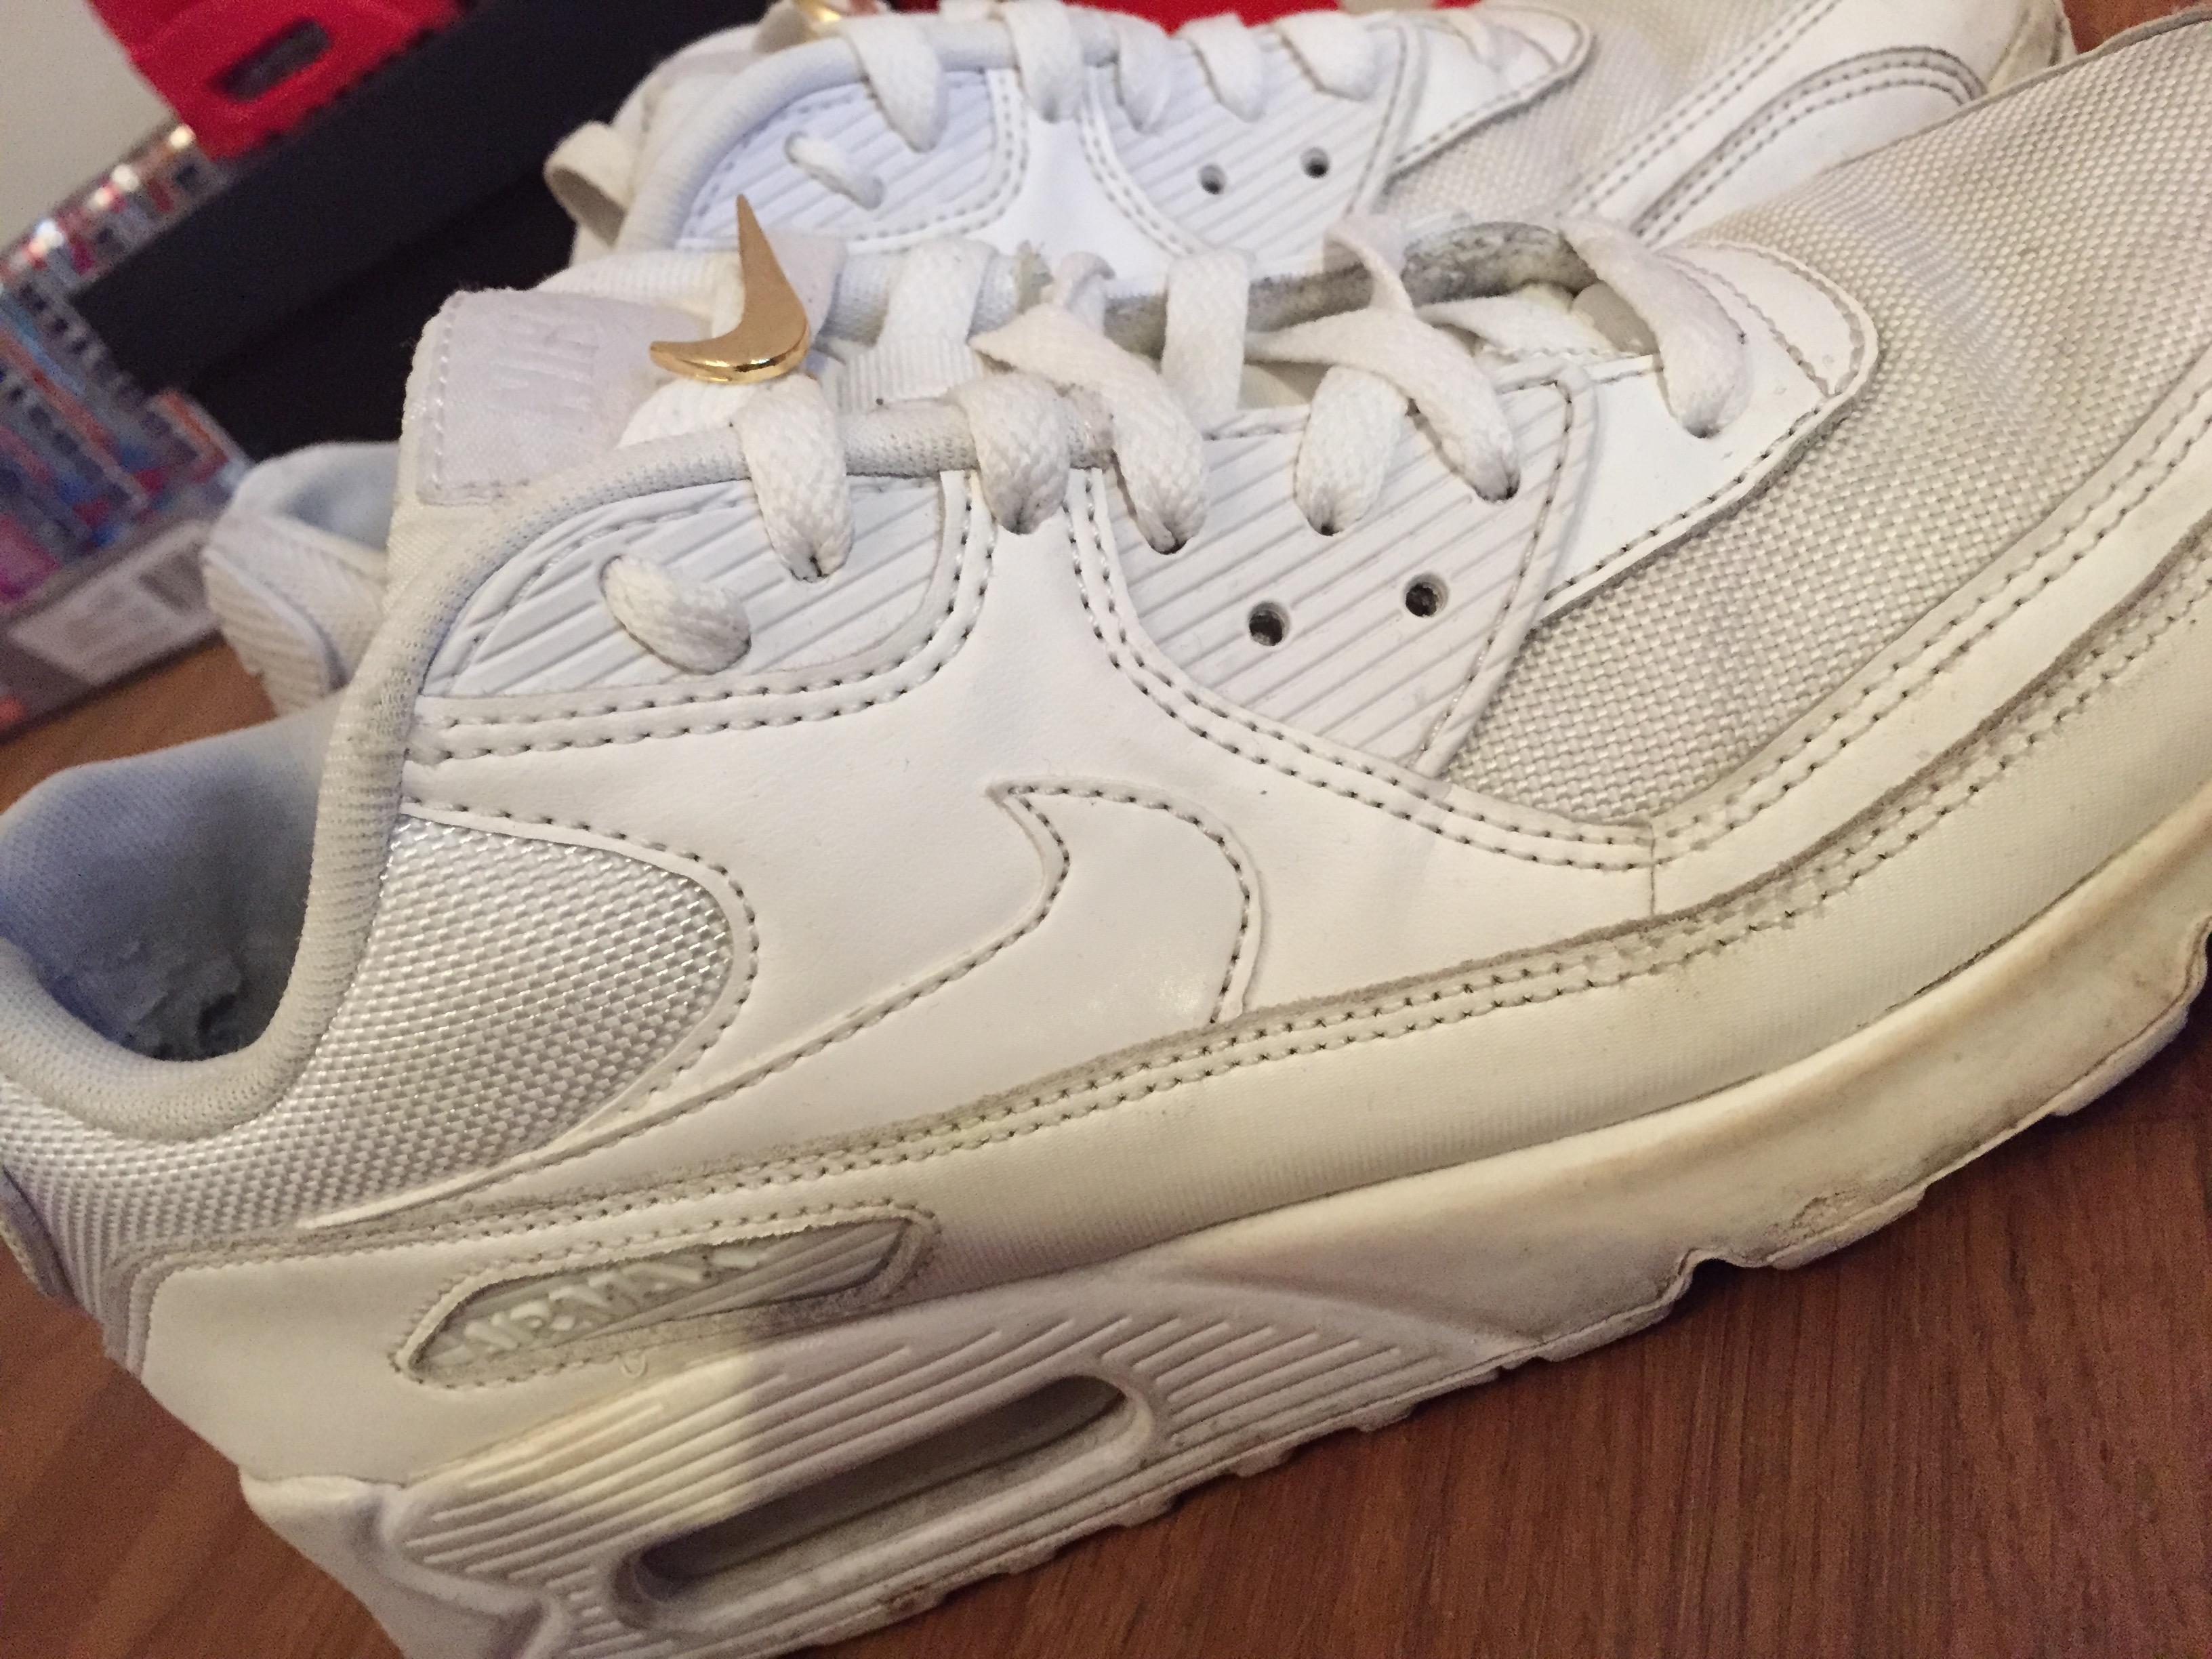 sale retailer 46292 58107 Nike Air Max Thea Schuhe Waschen